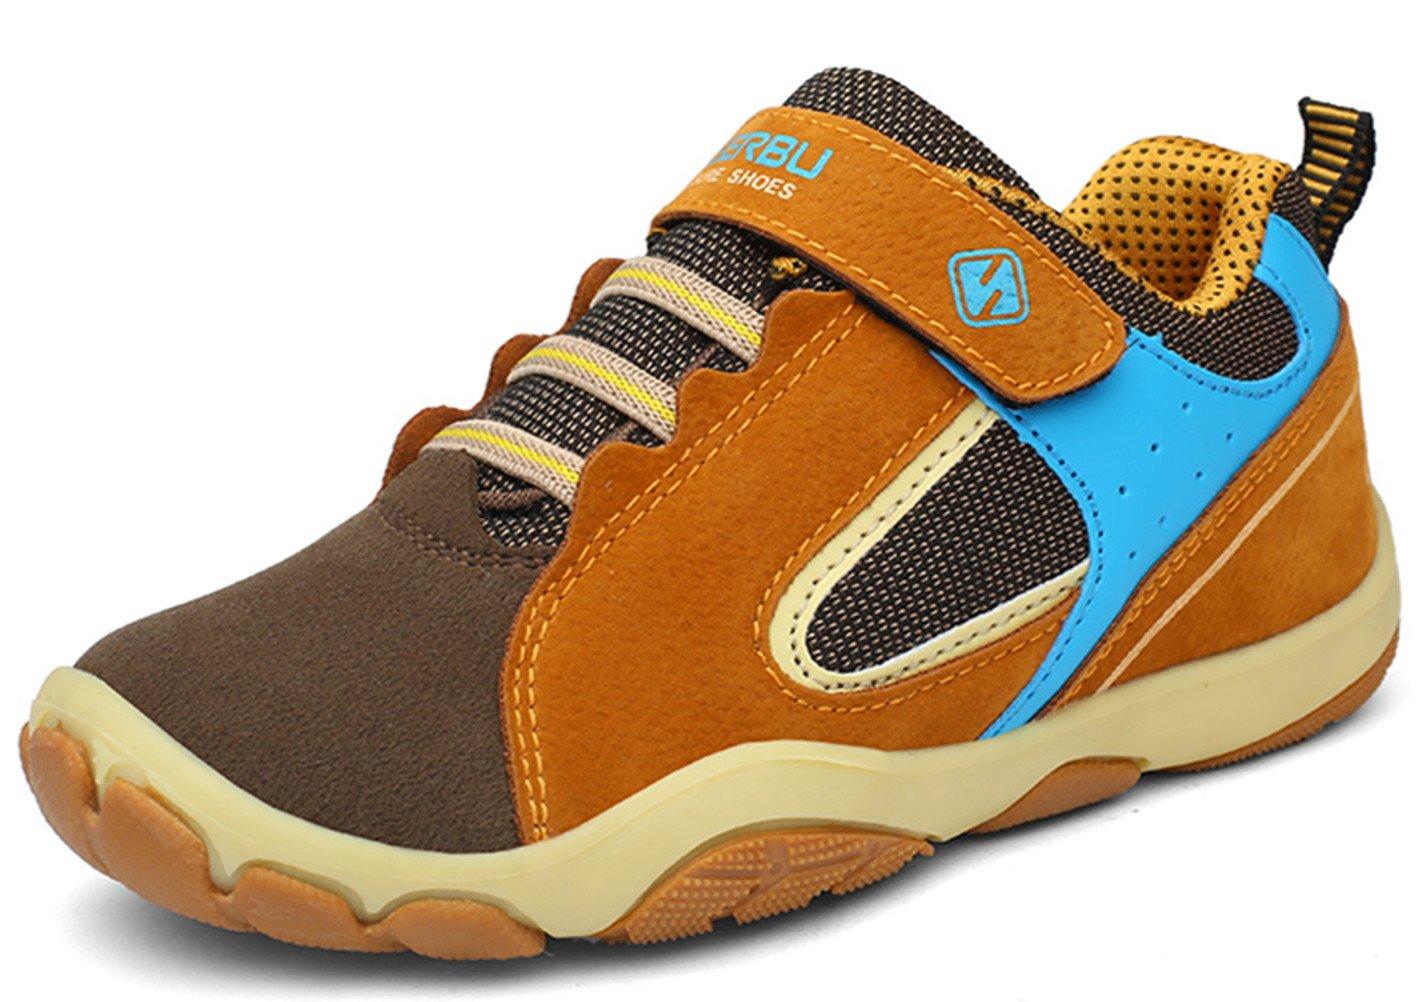 DADAWEN Kid's Outdoor Hiking Athletic Sneakers Strap Trail Running Shoes (Toddler/Little Kid/Big Kid) Brown US Size 5 M Big Kid by DADAWEN (Image #6)